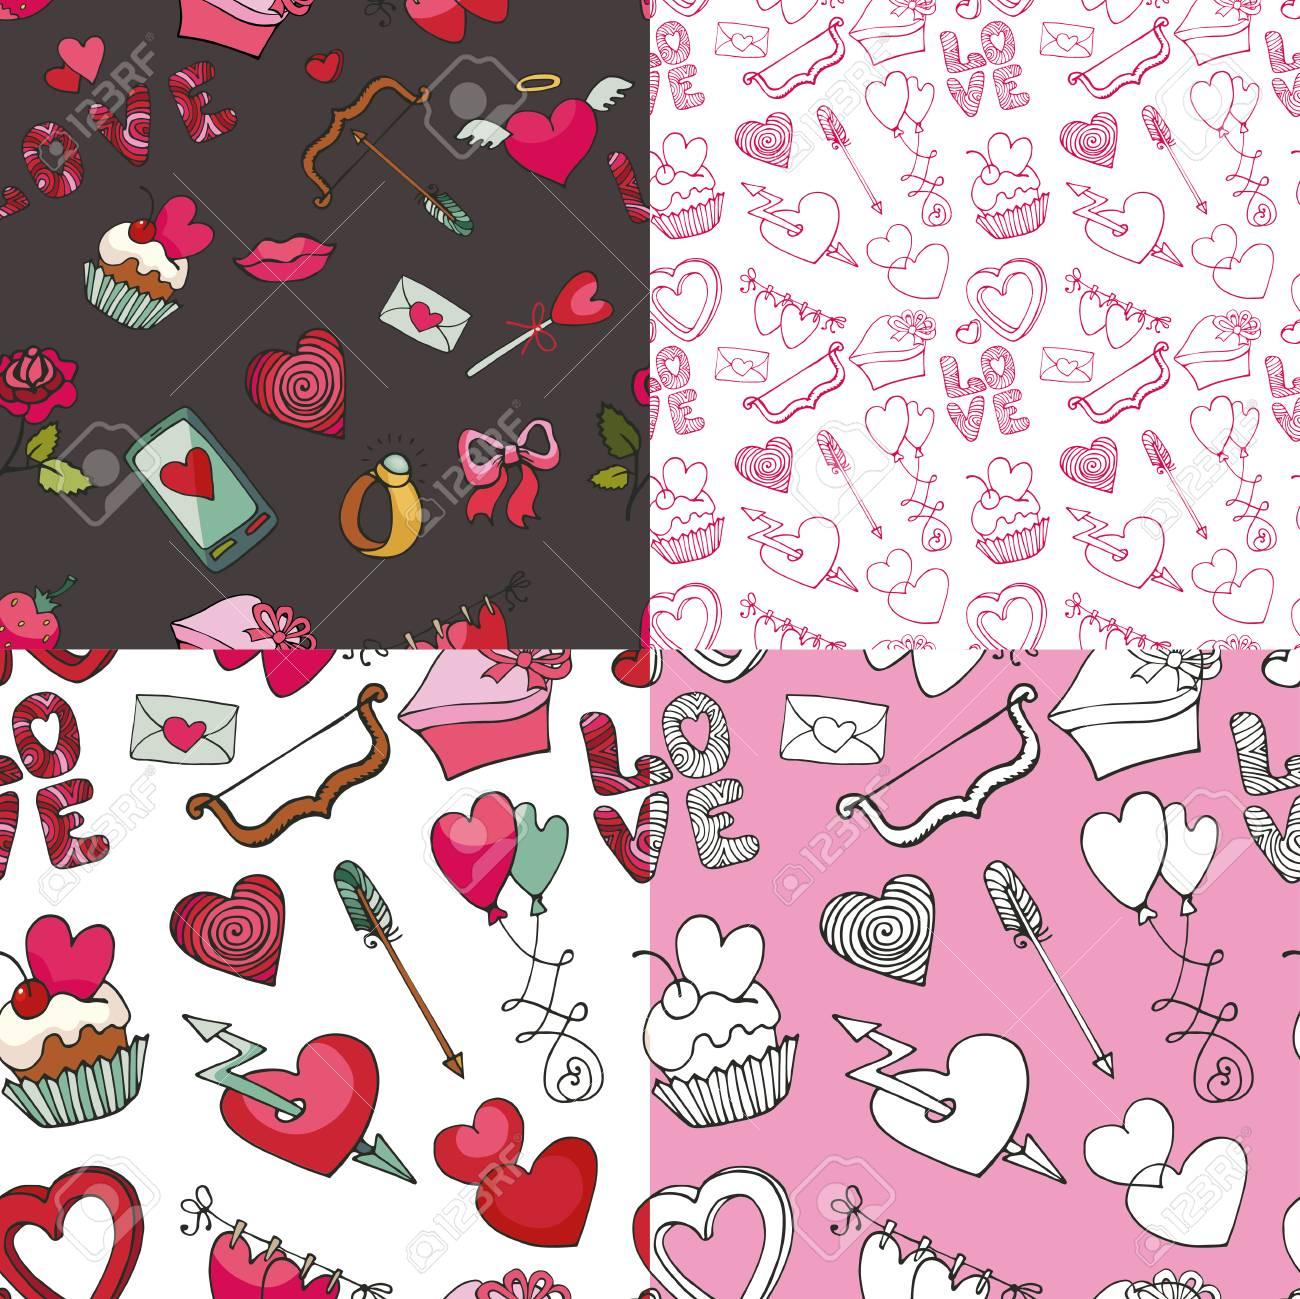 Valentines Day Wedding Love Romantic Decor Elements In Seamless